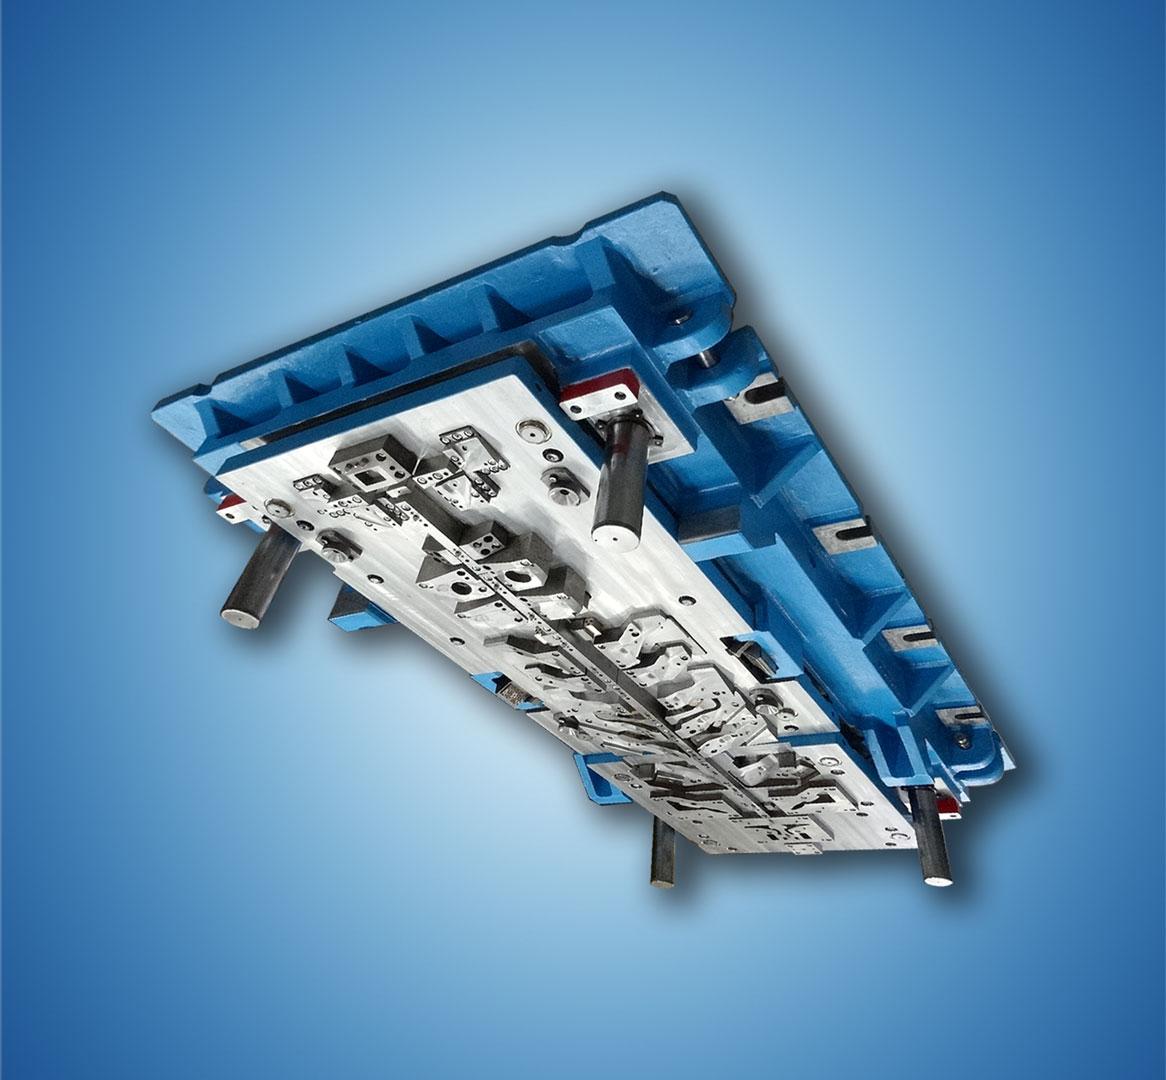 Ero-Projekt-d.o.o.-Toolshop-Werkzeugbau-2-Orodje-za-preoblikov--plocevine-_-slika-2